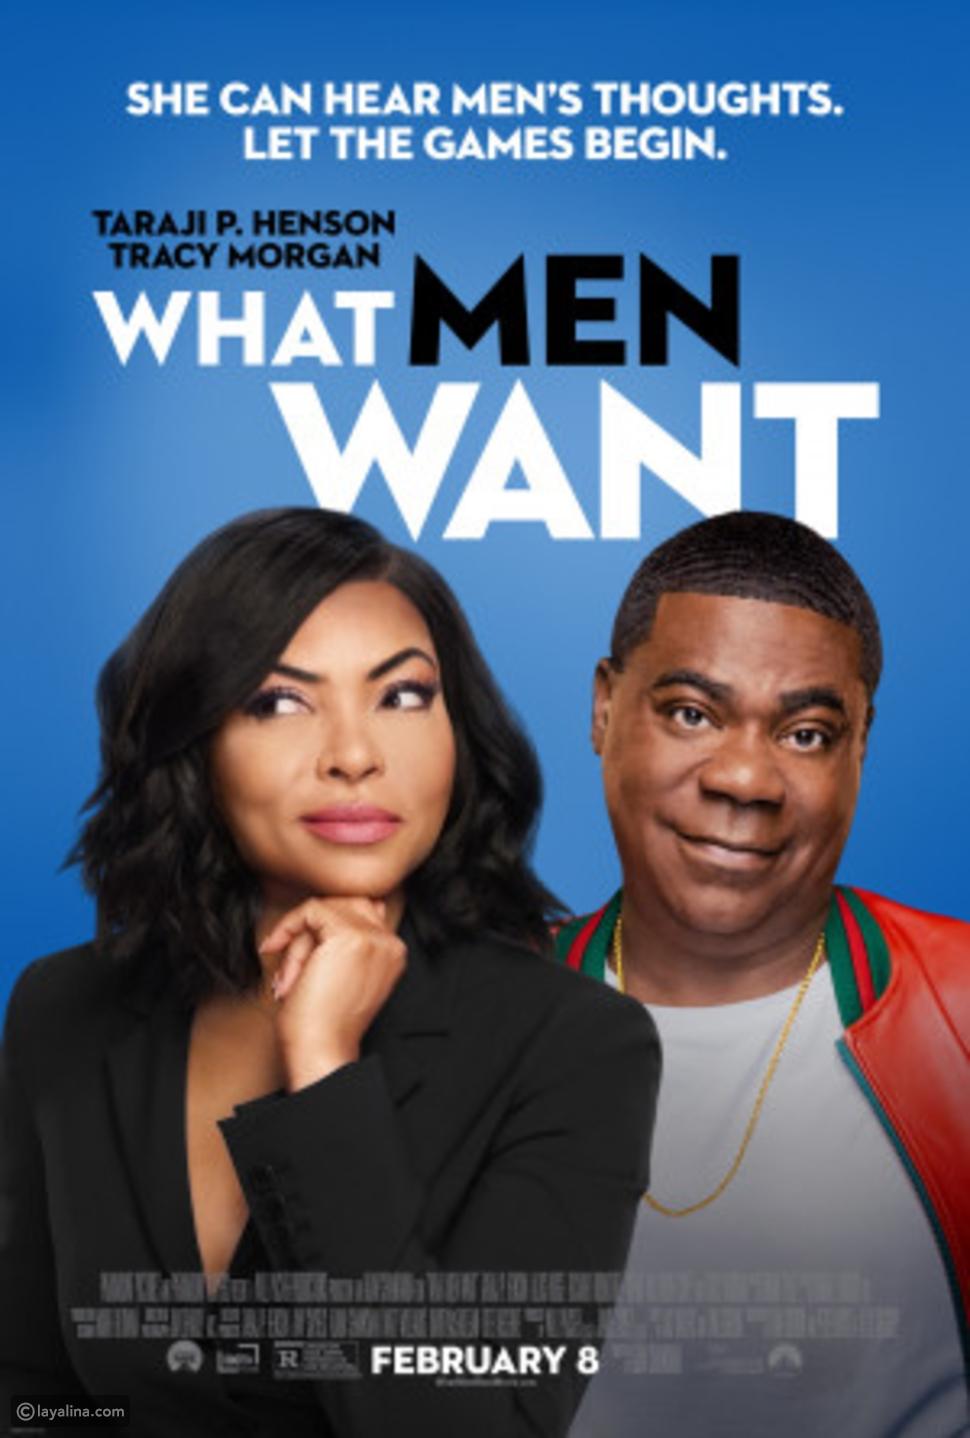 What Men Want فيلم رومانسي لسهرة عيد الحب